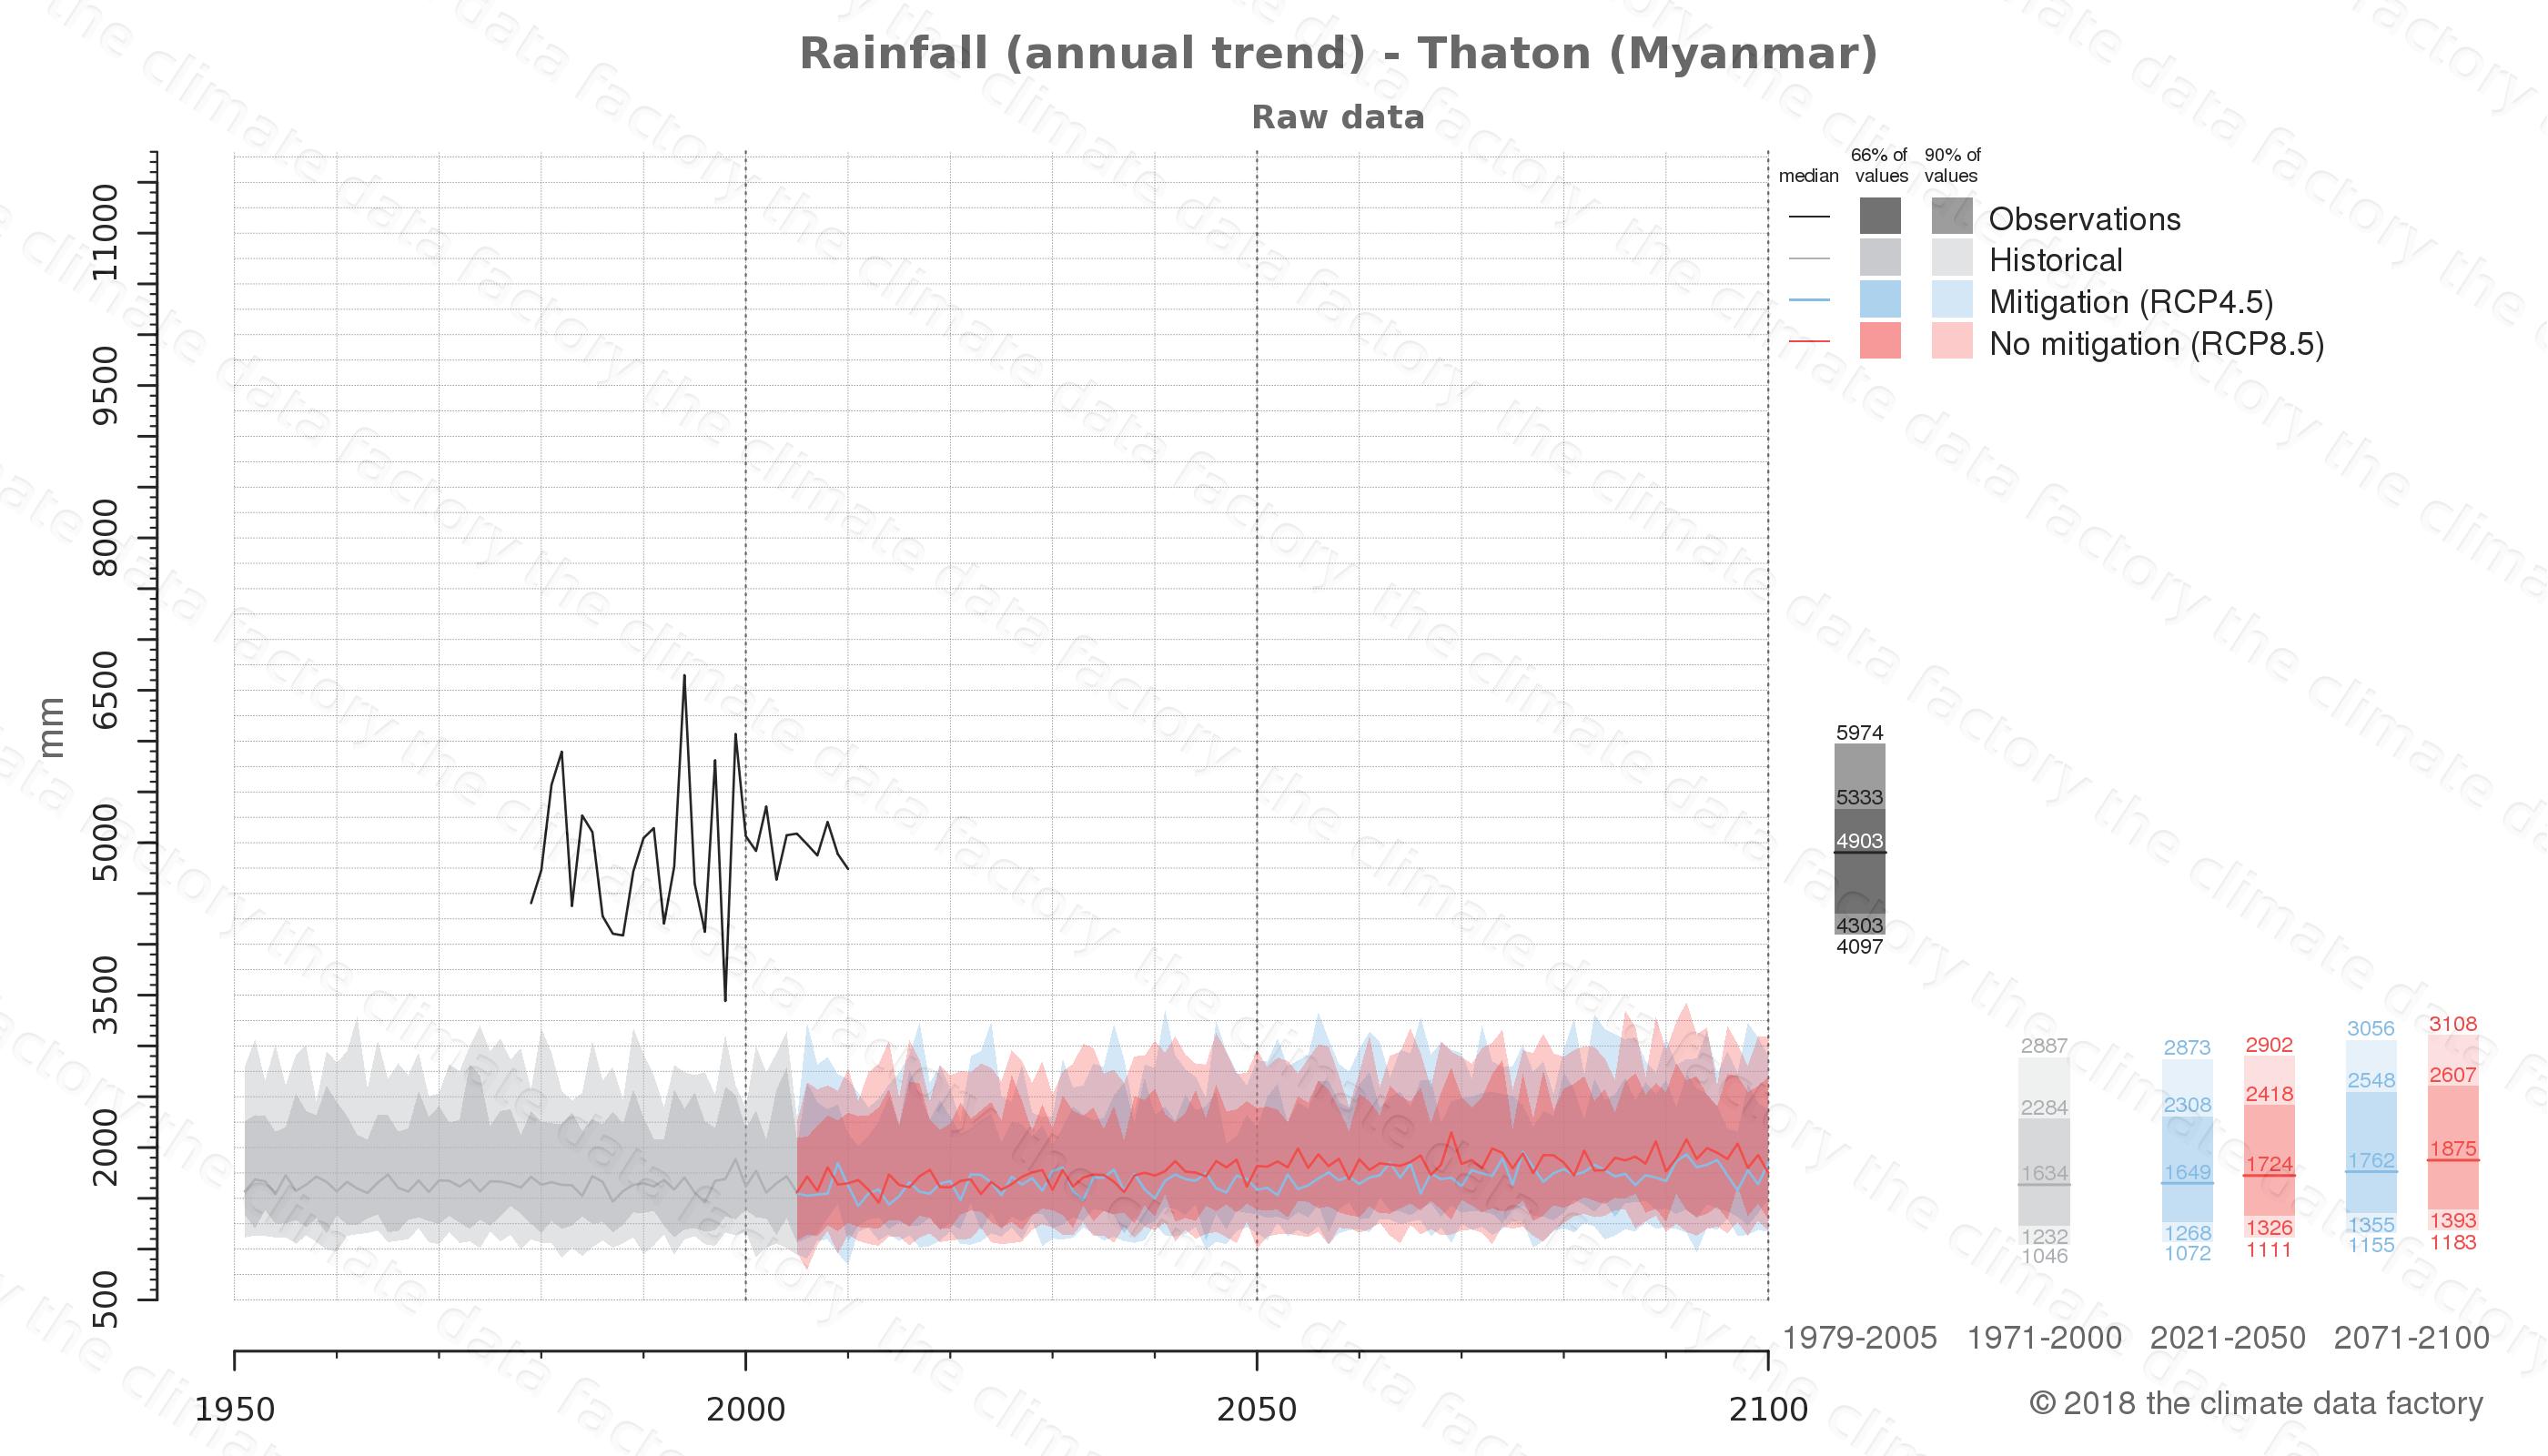 climate change data policy adaptation climate graph city data rainfall thaton myanmar